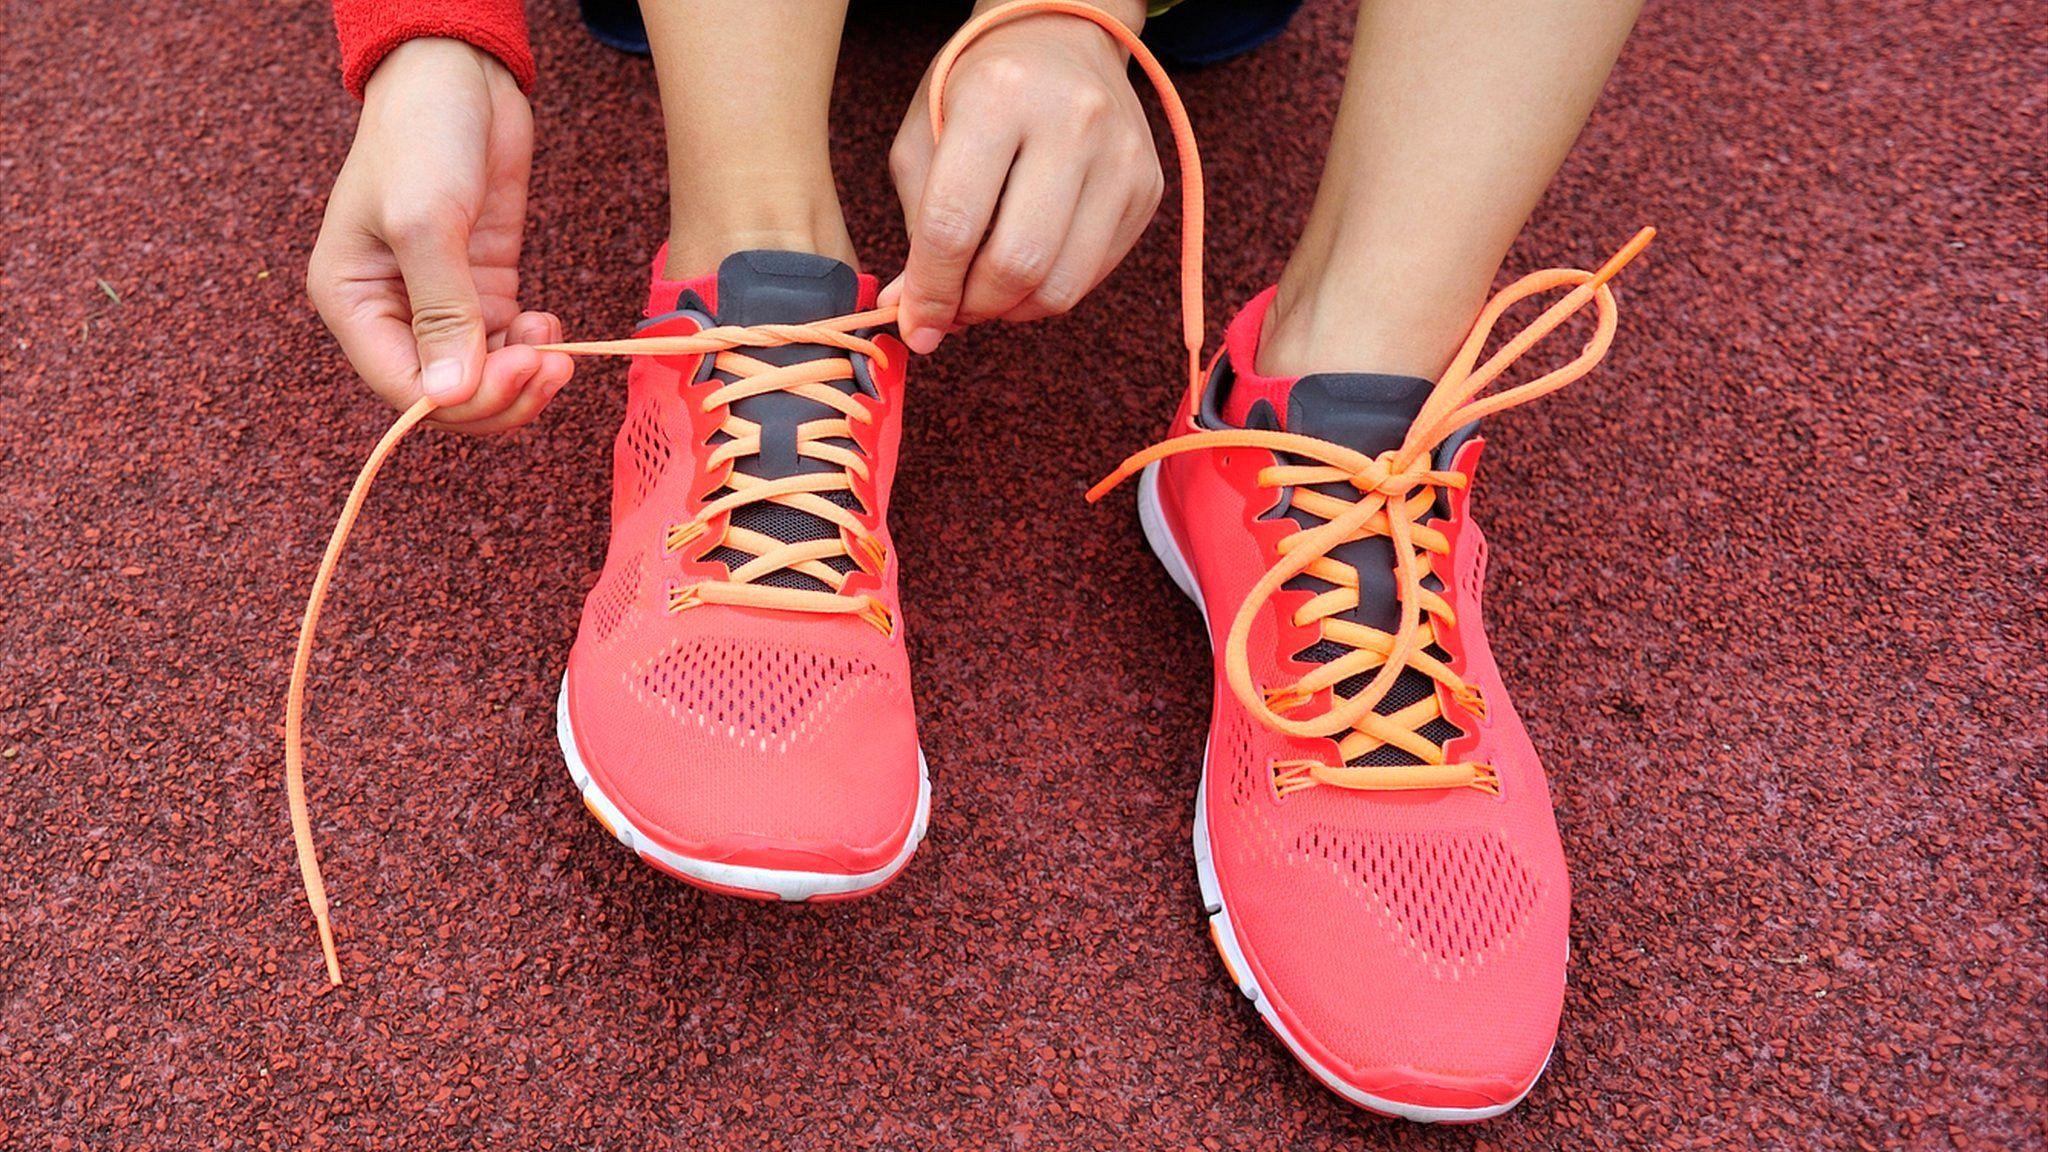 zapatos skechers mujer baratos zona sur mujer facebook